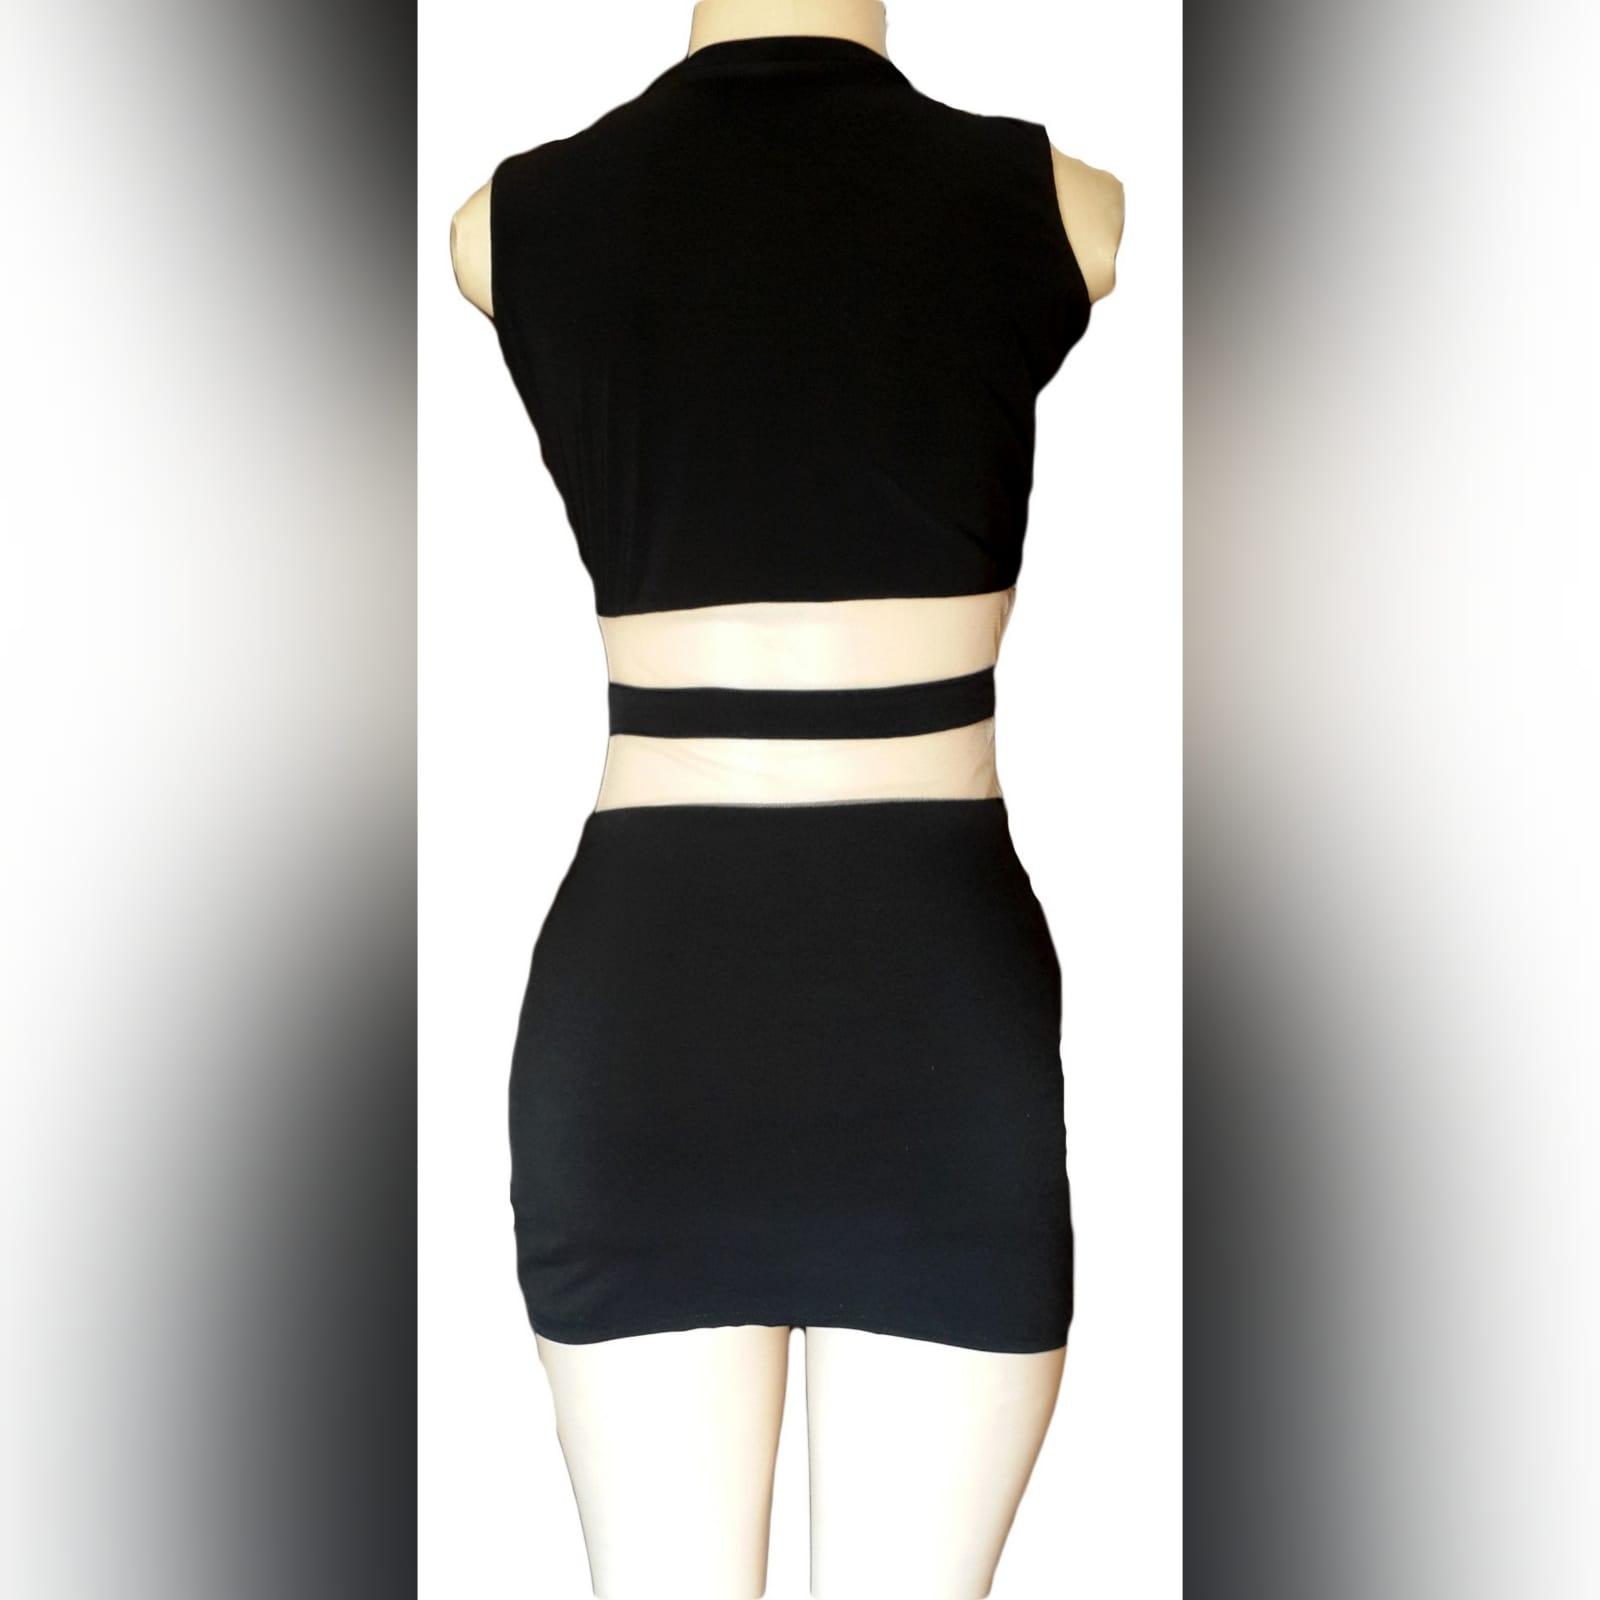 Mini black smart casual dress 4 mini black smart casual dress with see through tummy design and funky neckline